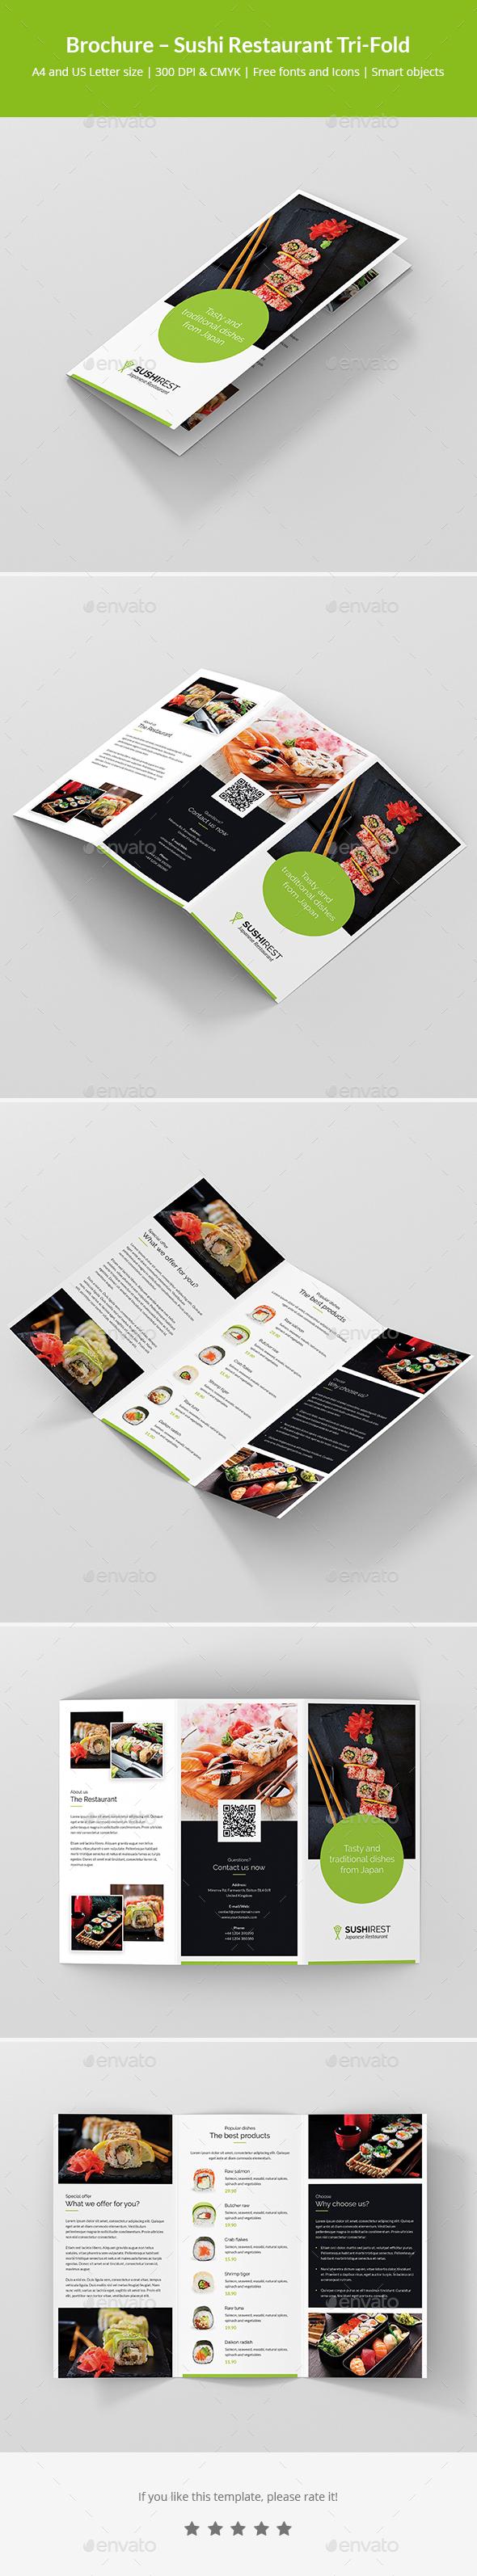 Brochure – Sushi Restaurant Tri-Fold - Informational Brochures